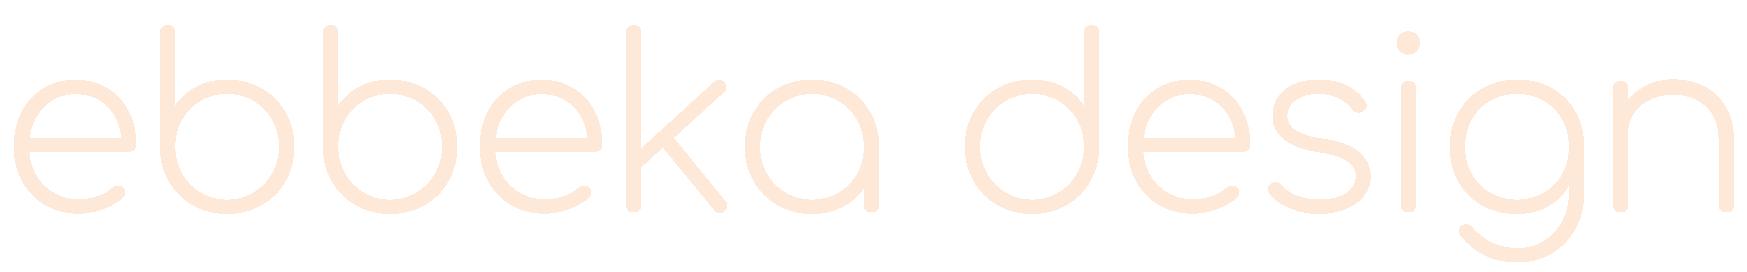 Ebbeka Design